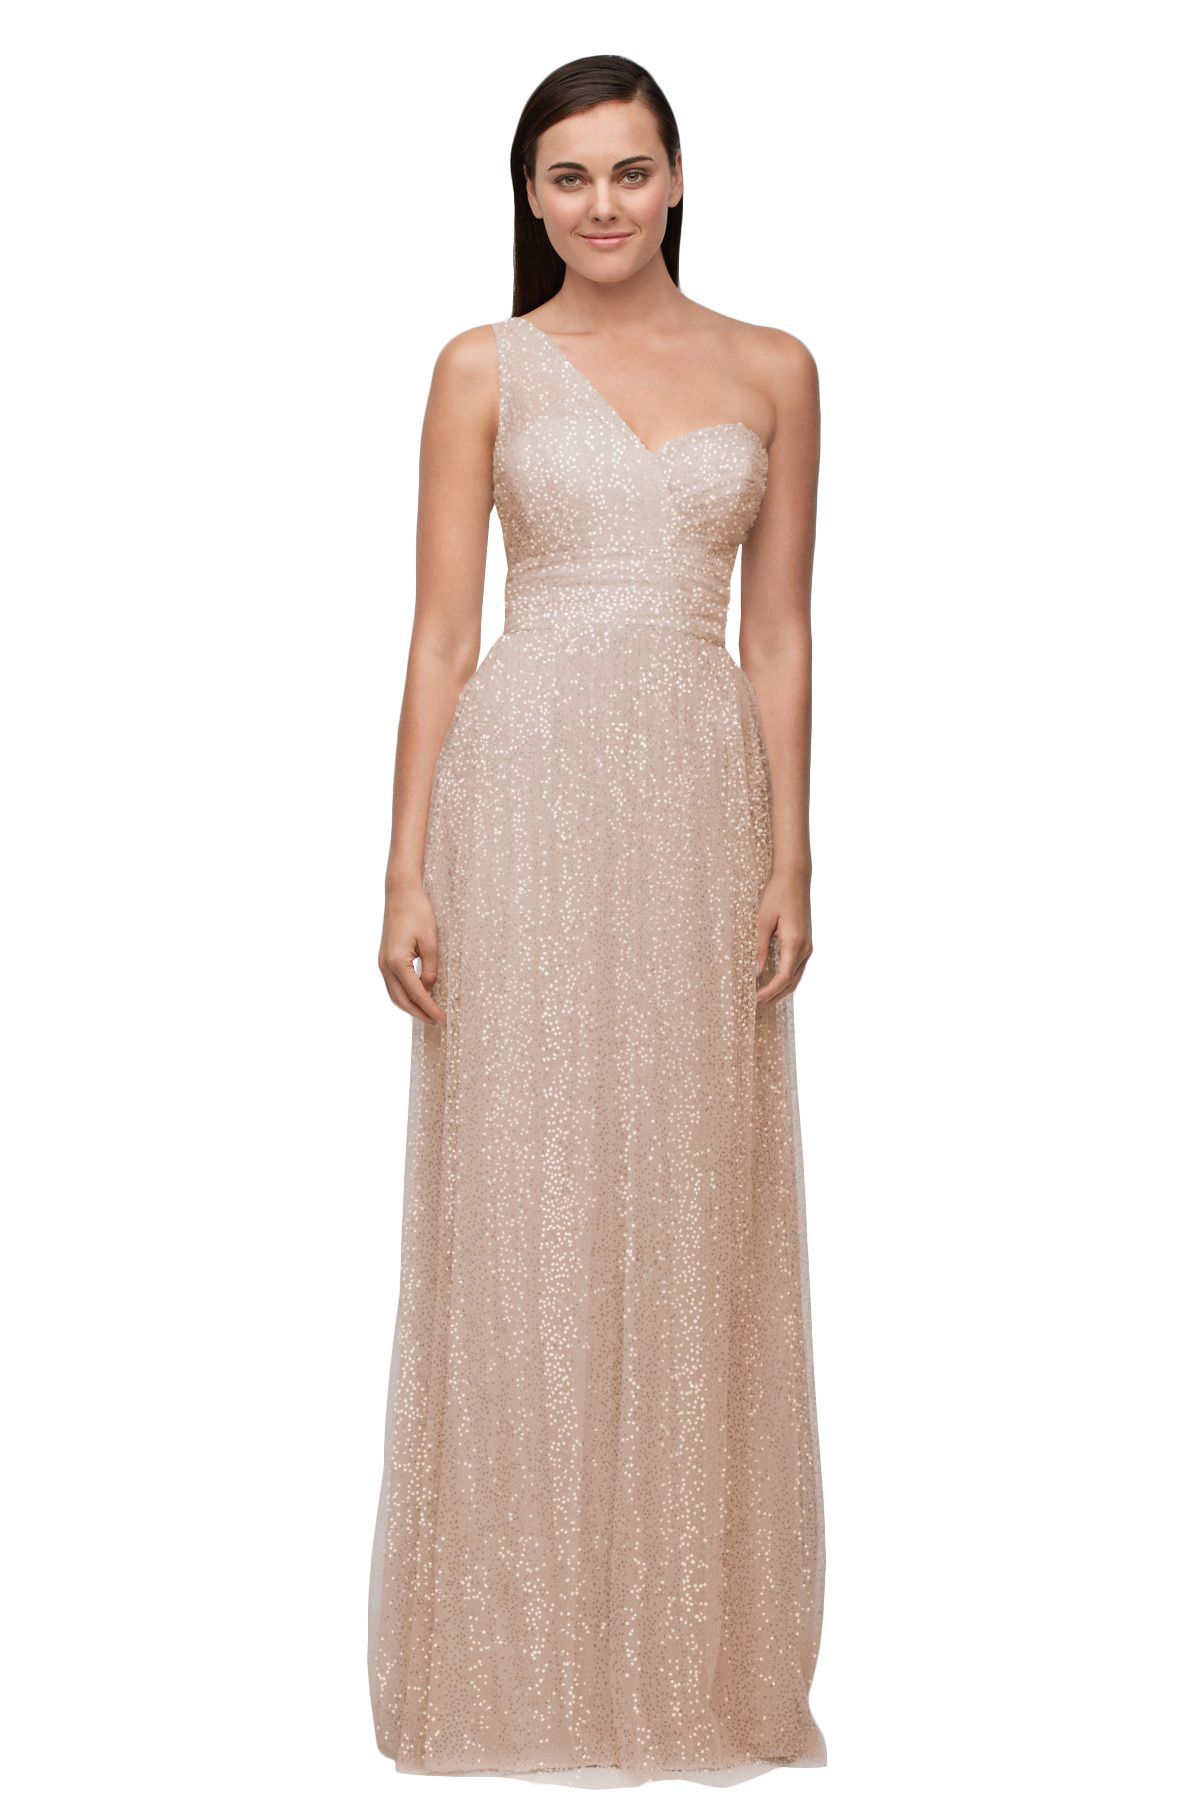 Shop watters bridesmaid dress 9366 in rocio sequin tulle at shop watters bridesmaid dress 9366 in rocio sequin tulle at weddington way find the ombrellifo Images